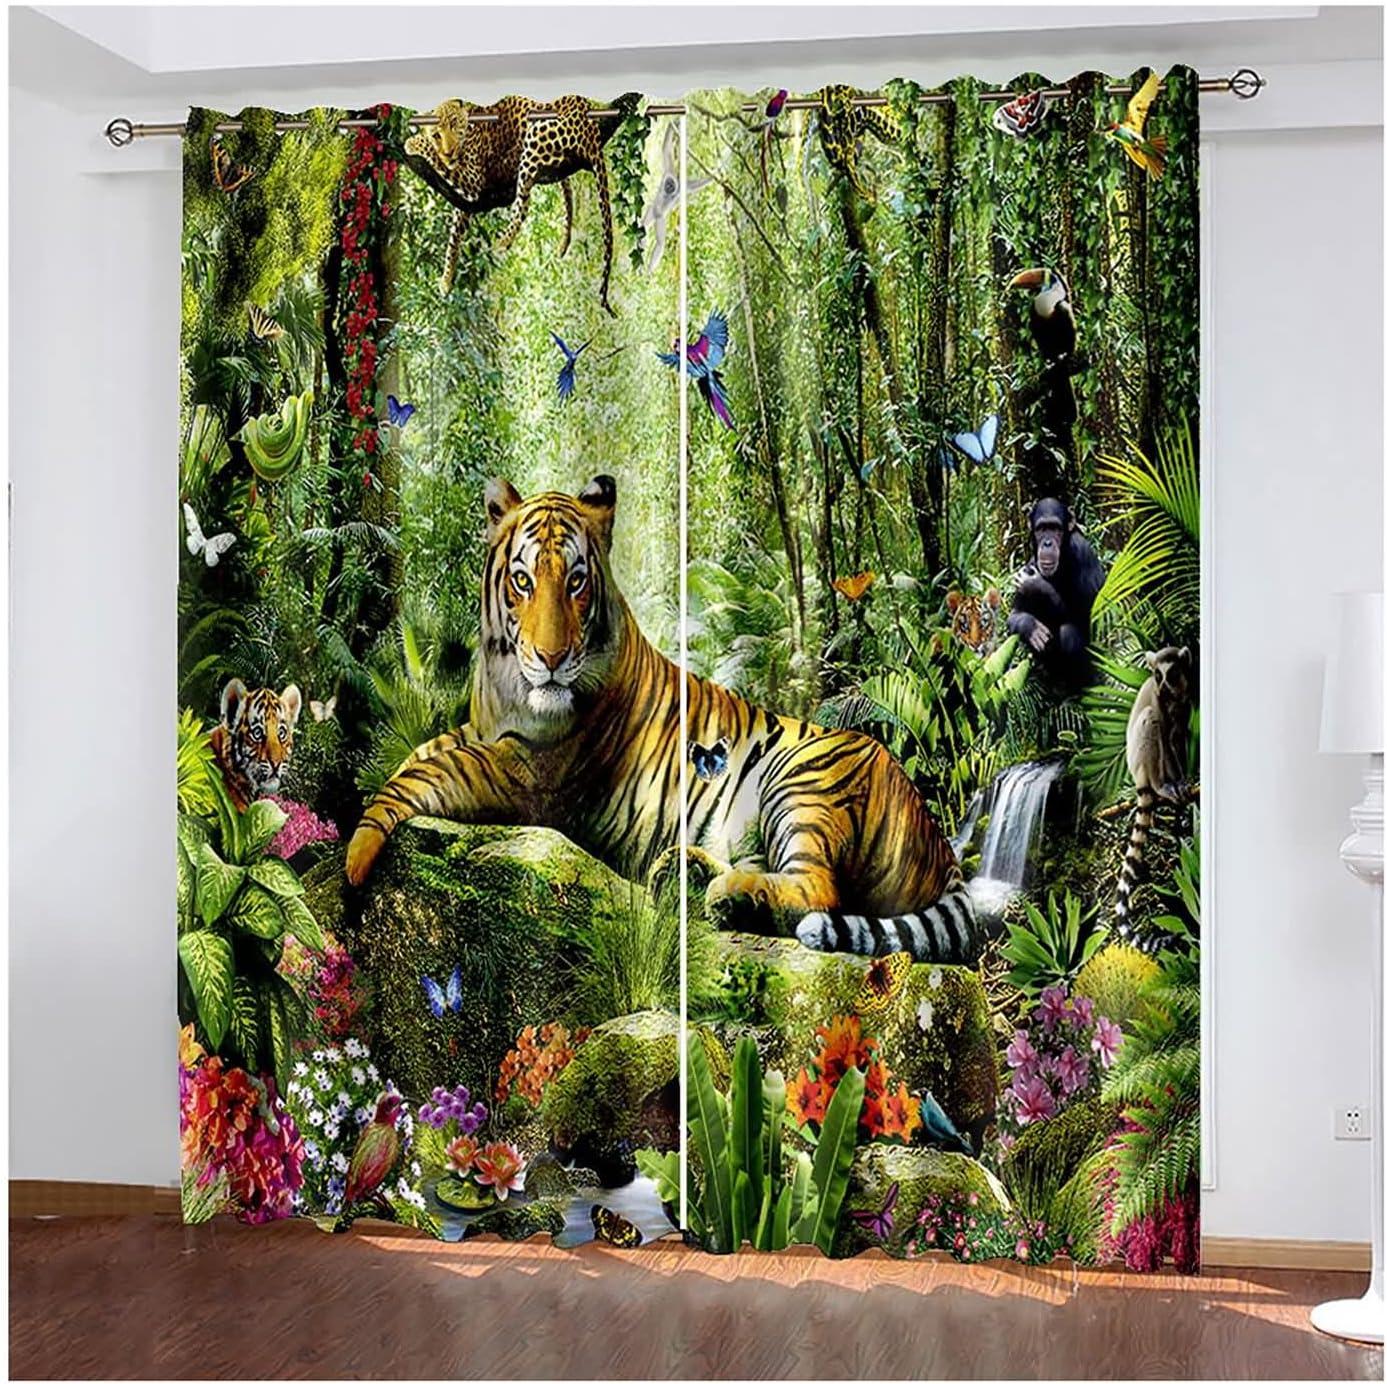 Daesar Curtains for Living Room Bedro 2 Ranking TOP18 Set Panels Translated